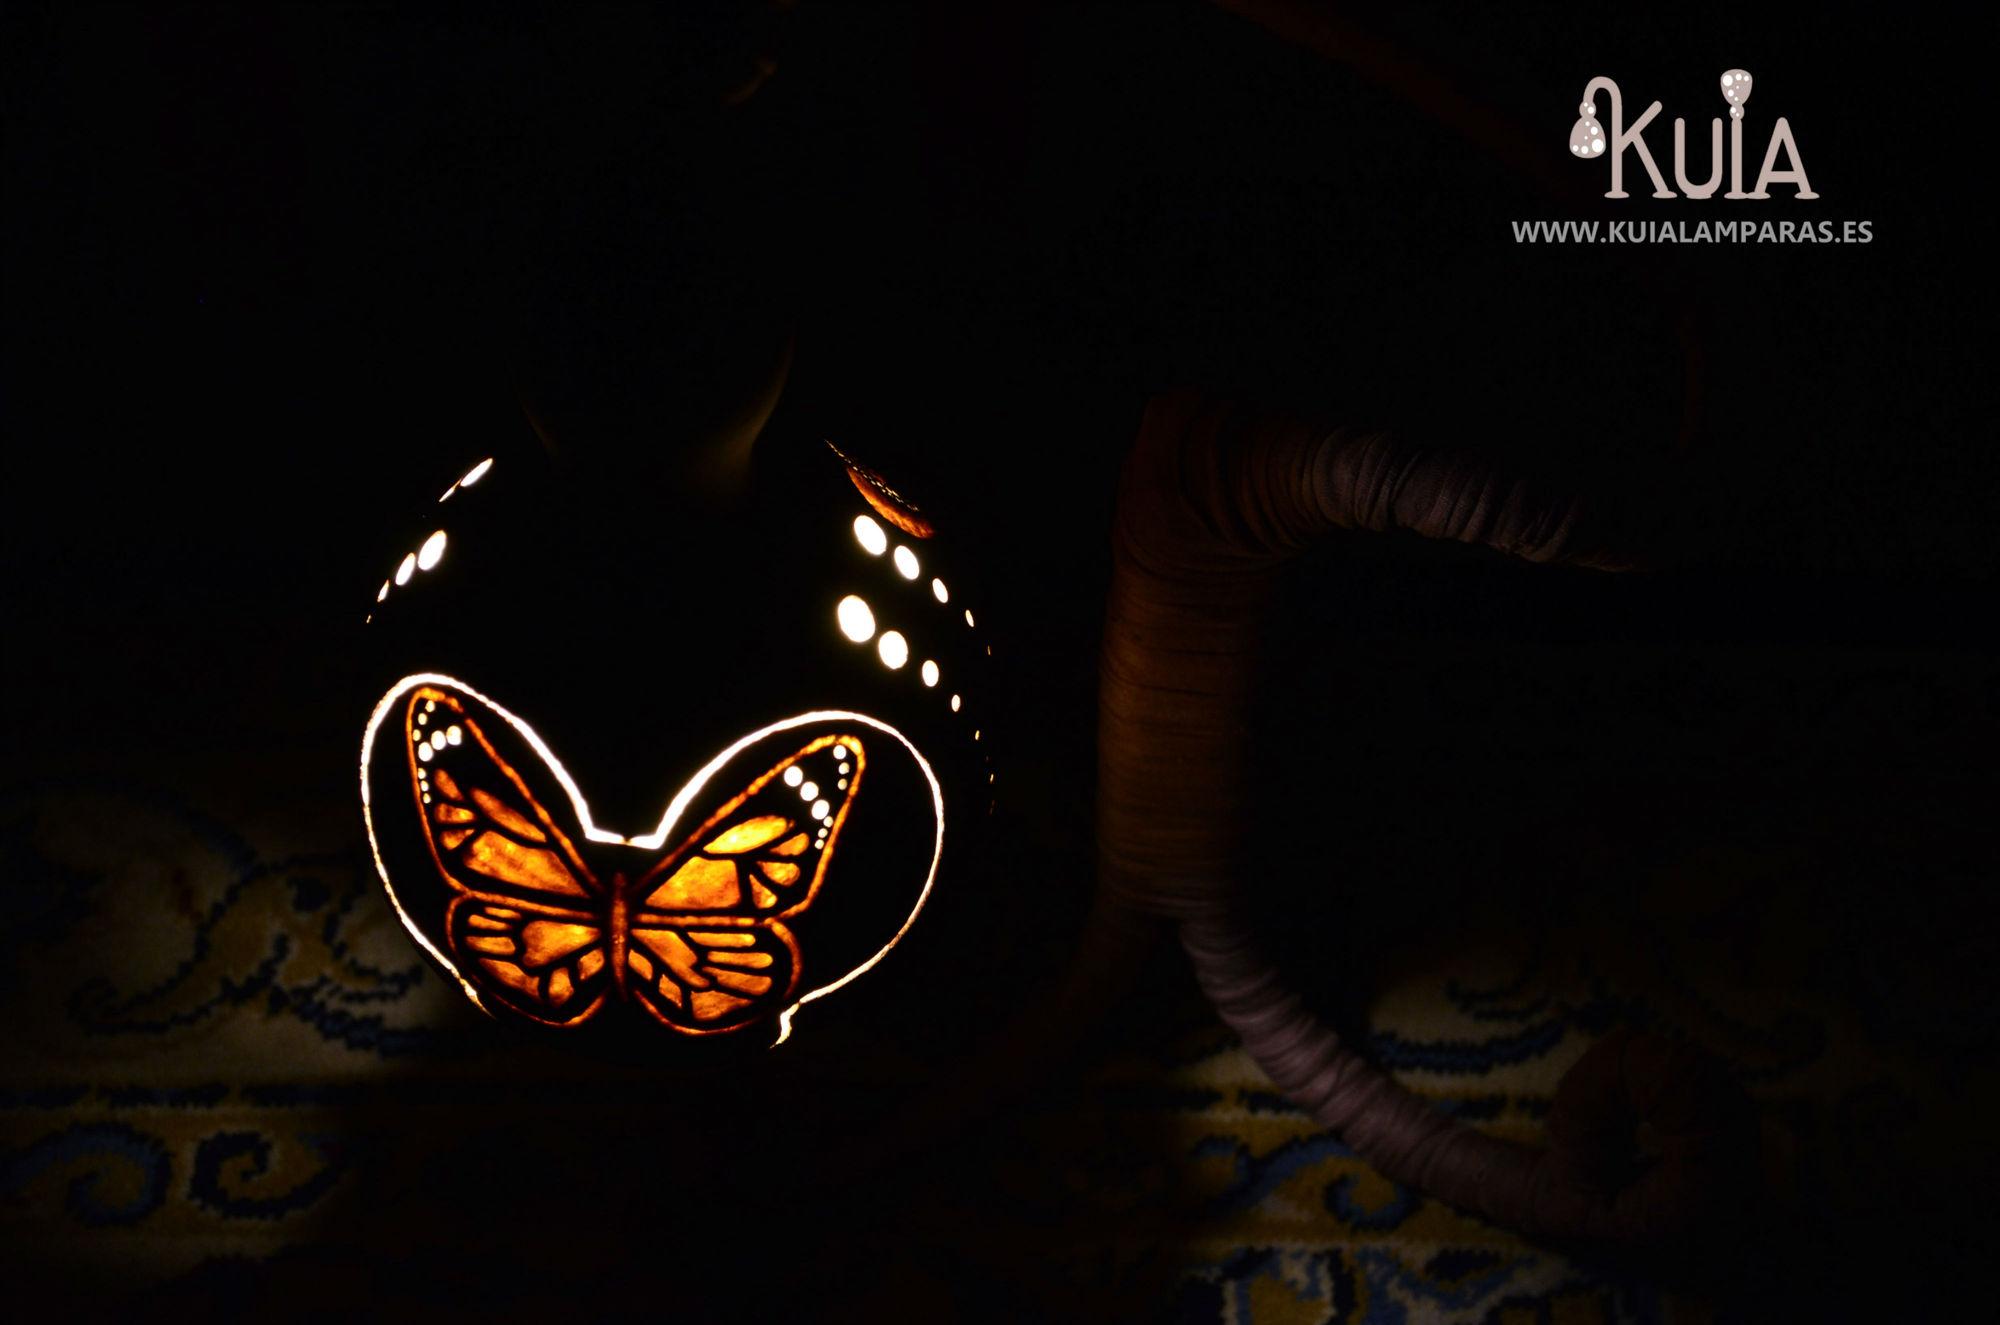 lampara con una mariposa pinpilinpauxa